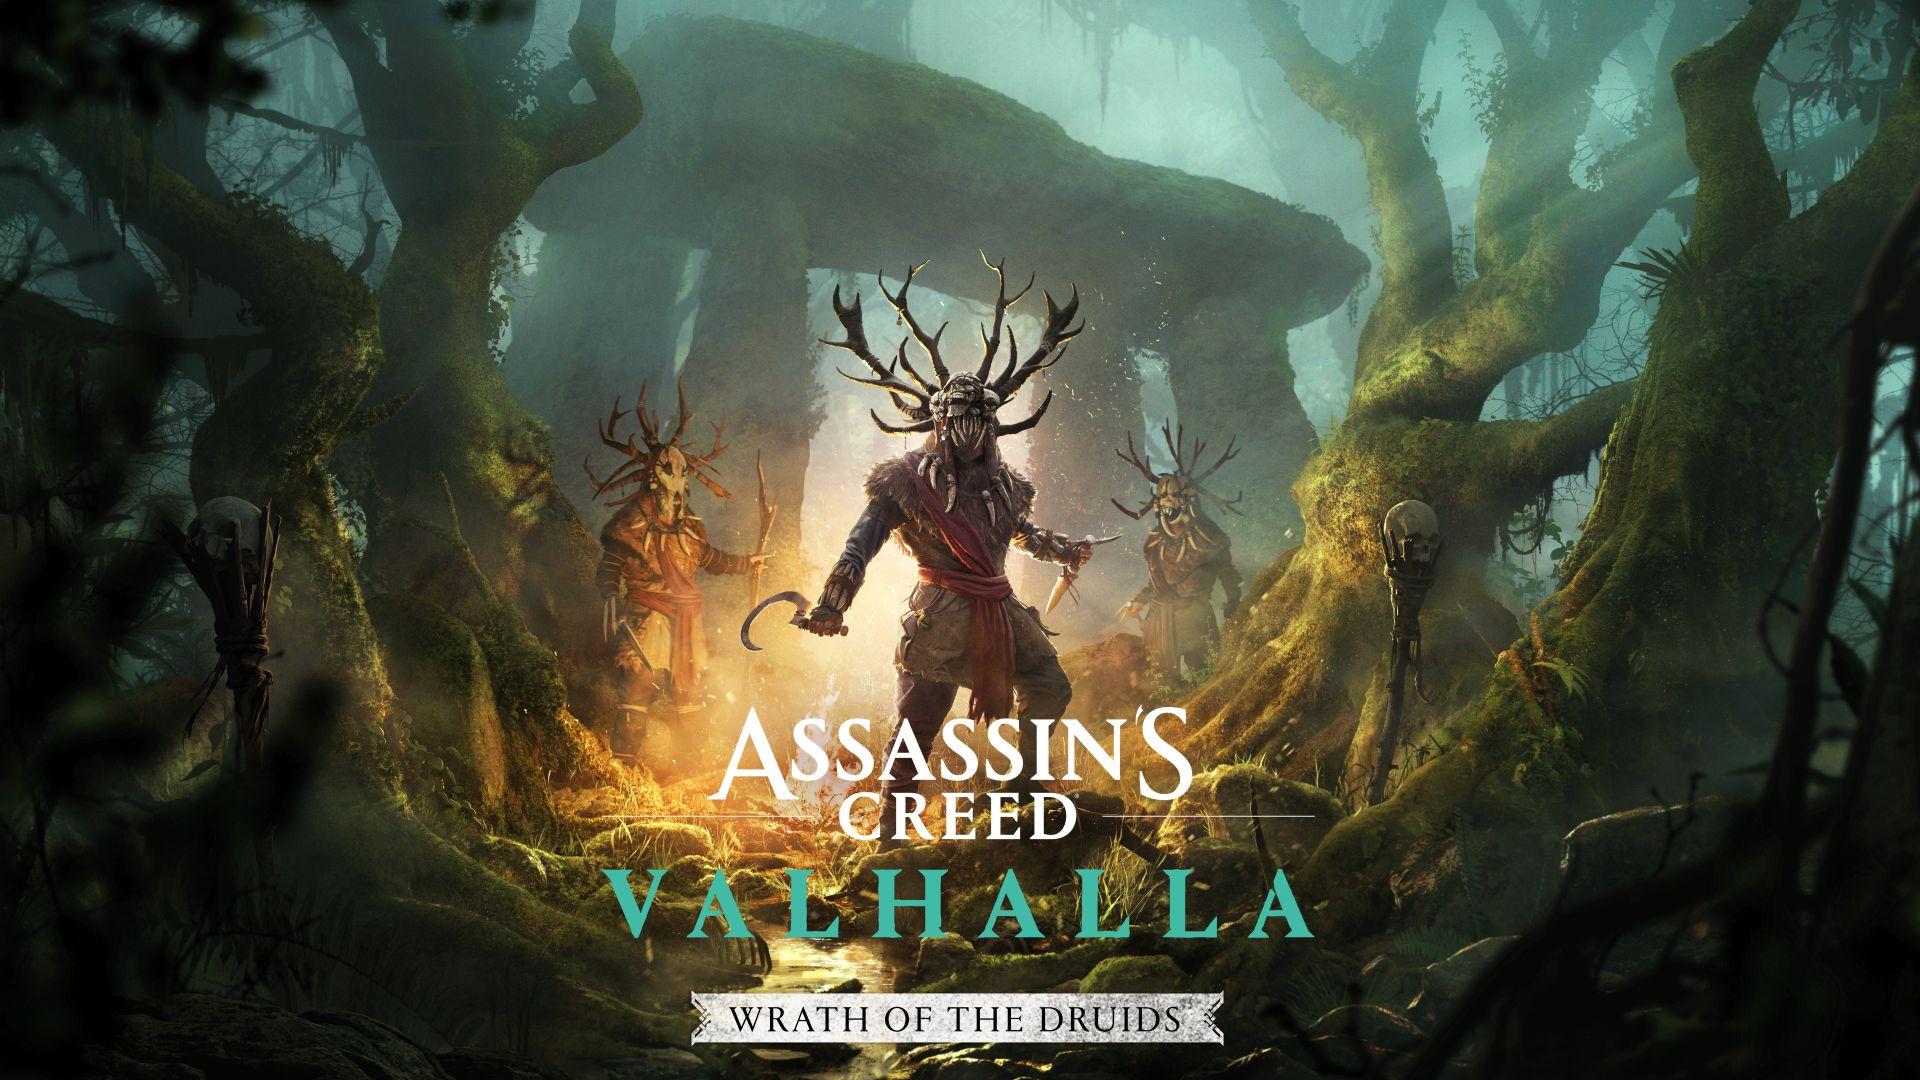 Assassins-Creed-Valhalla-Wrath-of-the-Druids.jpg